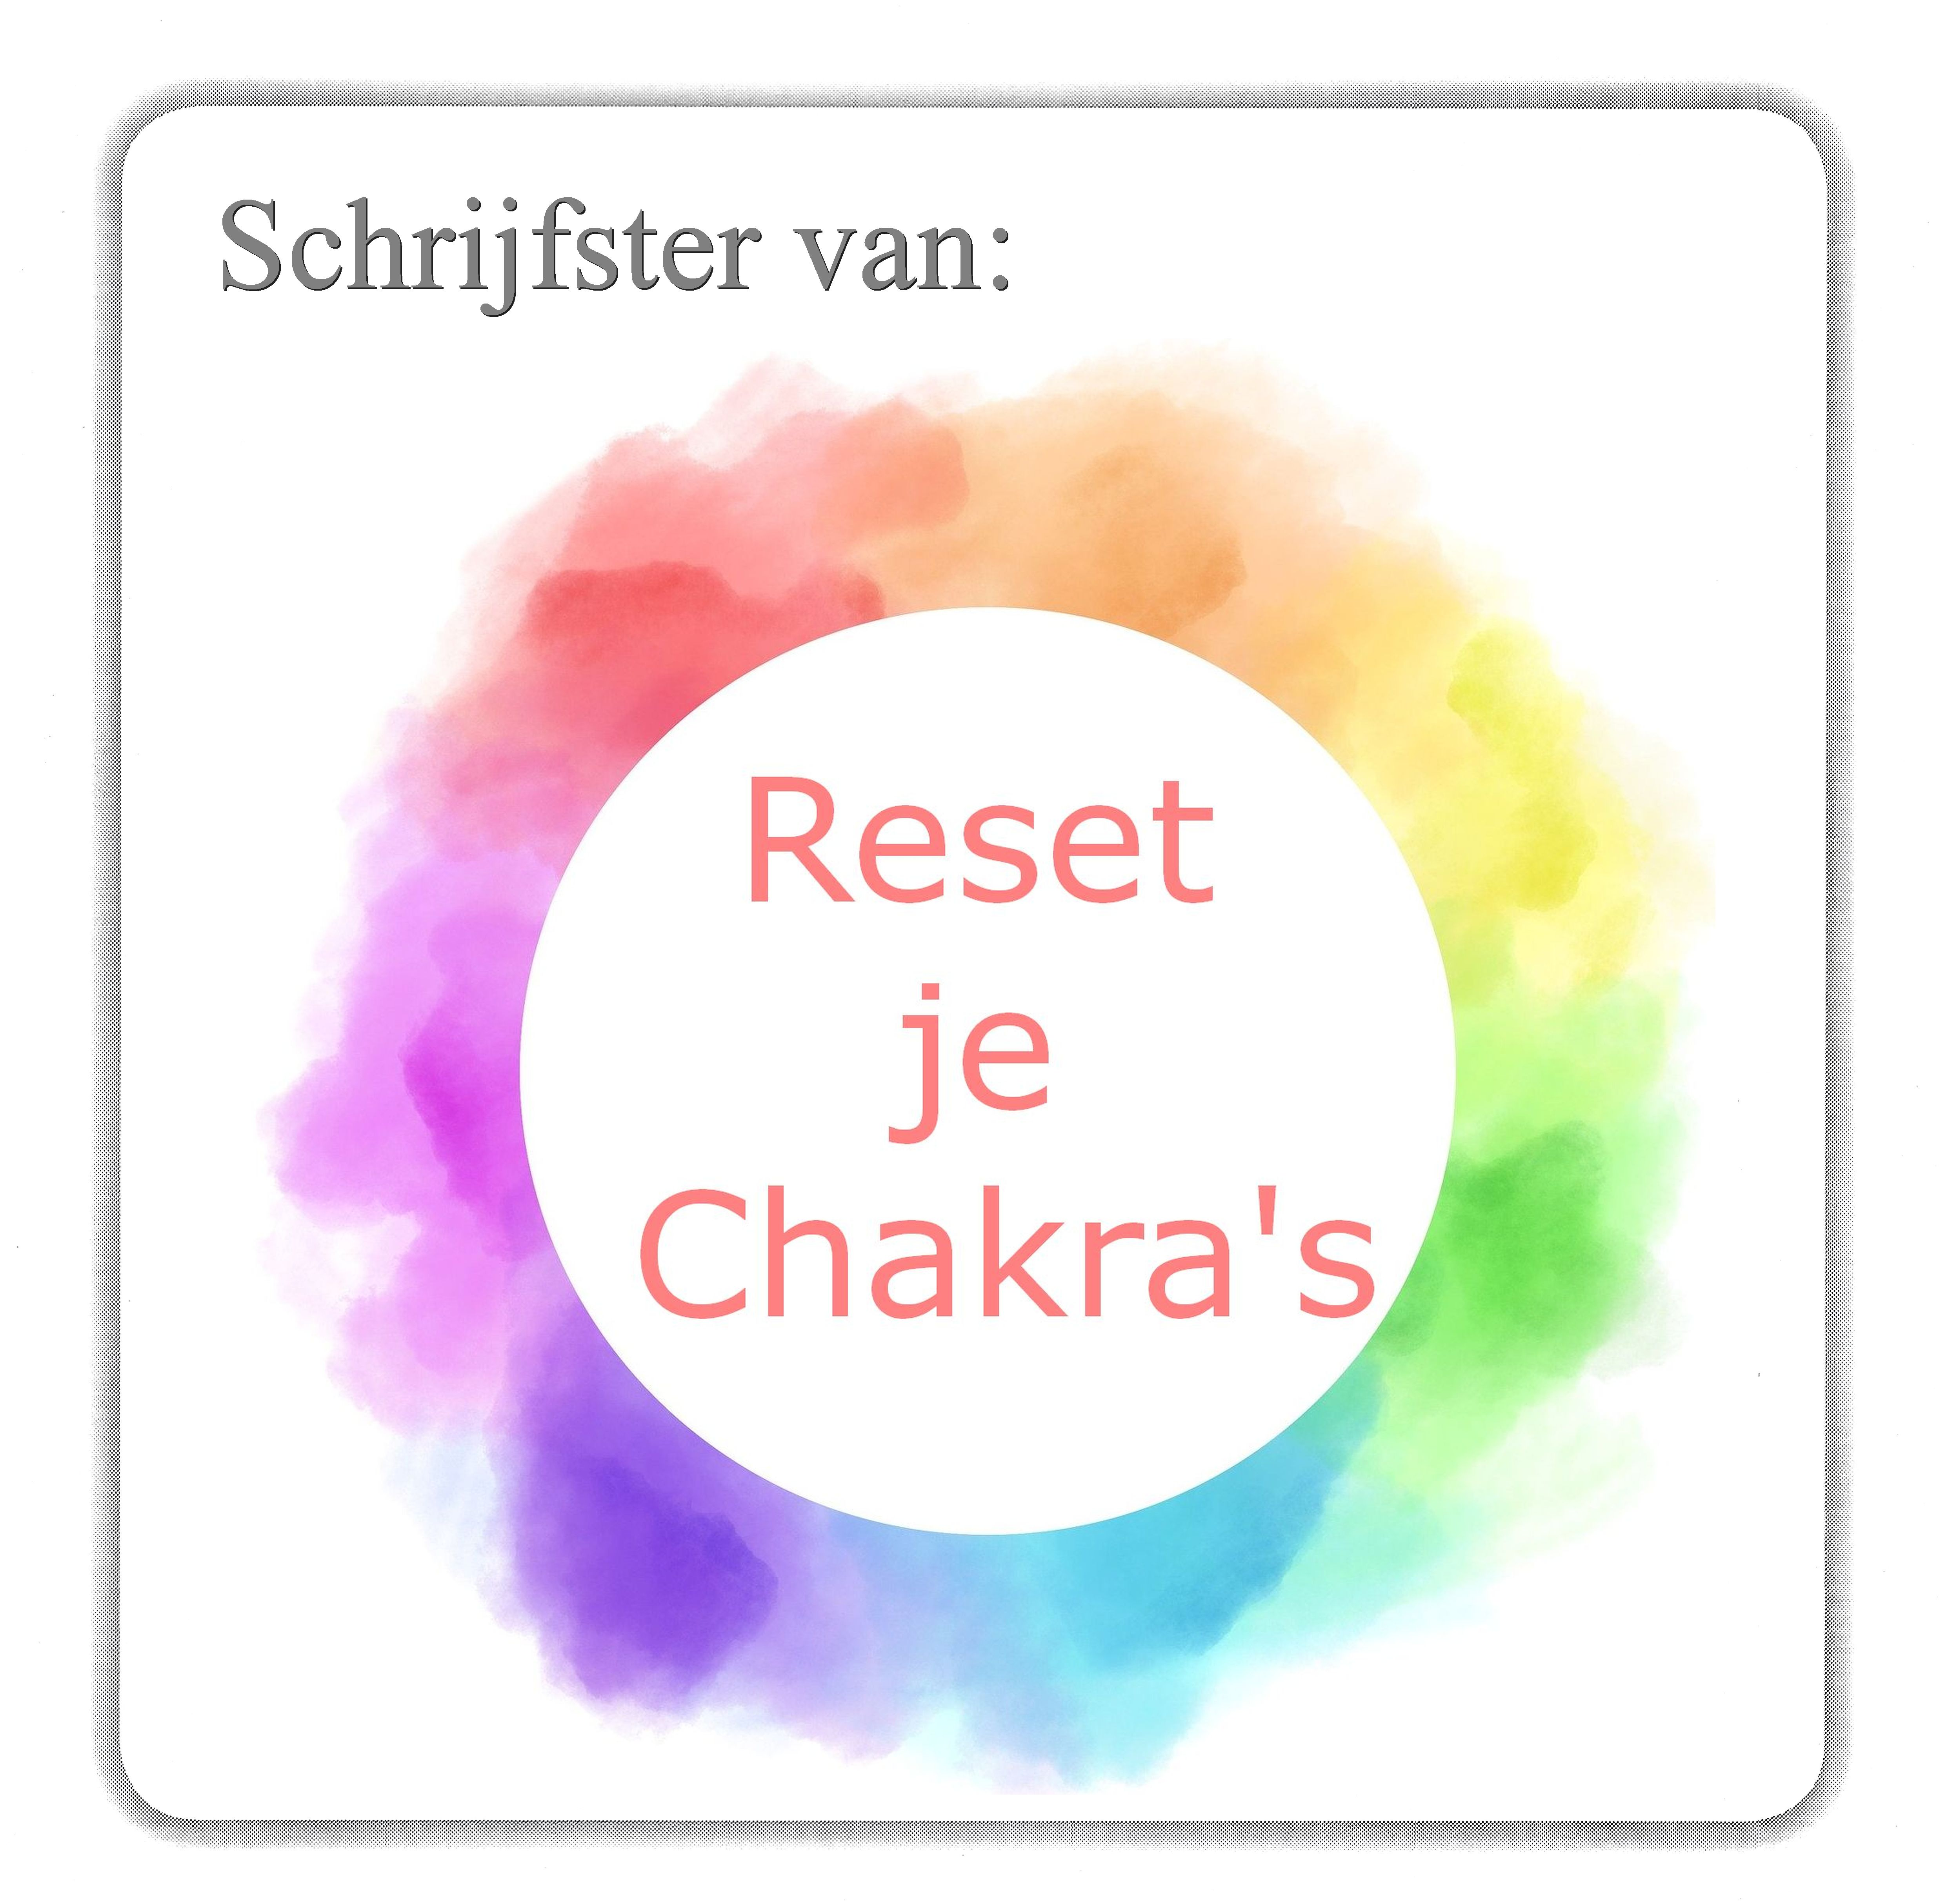 Reset je Chakras's